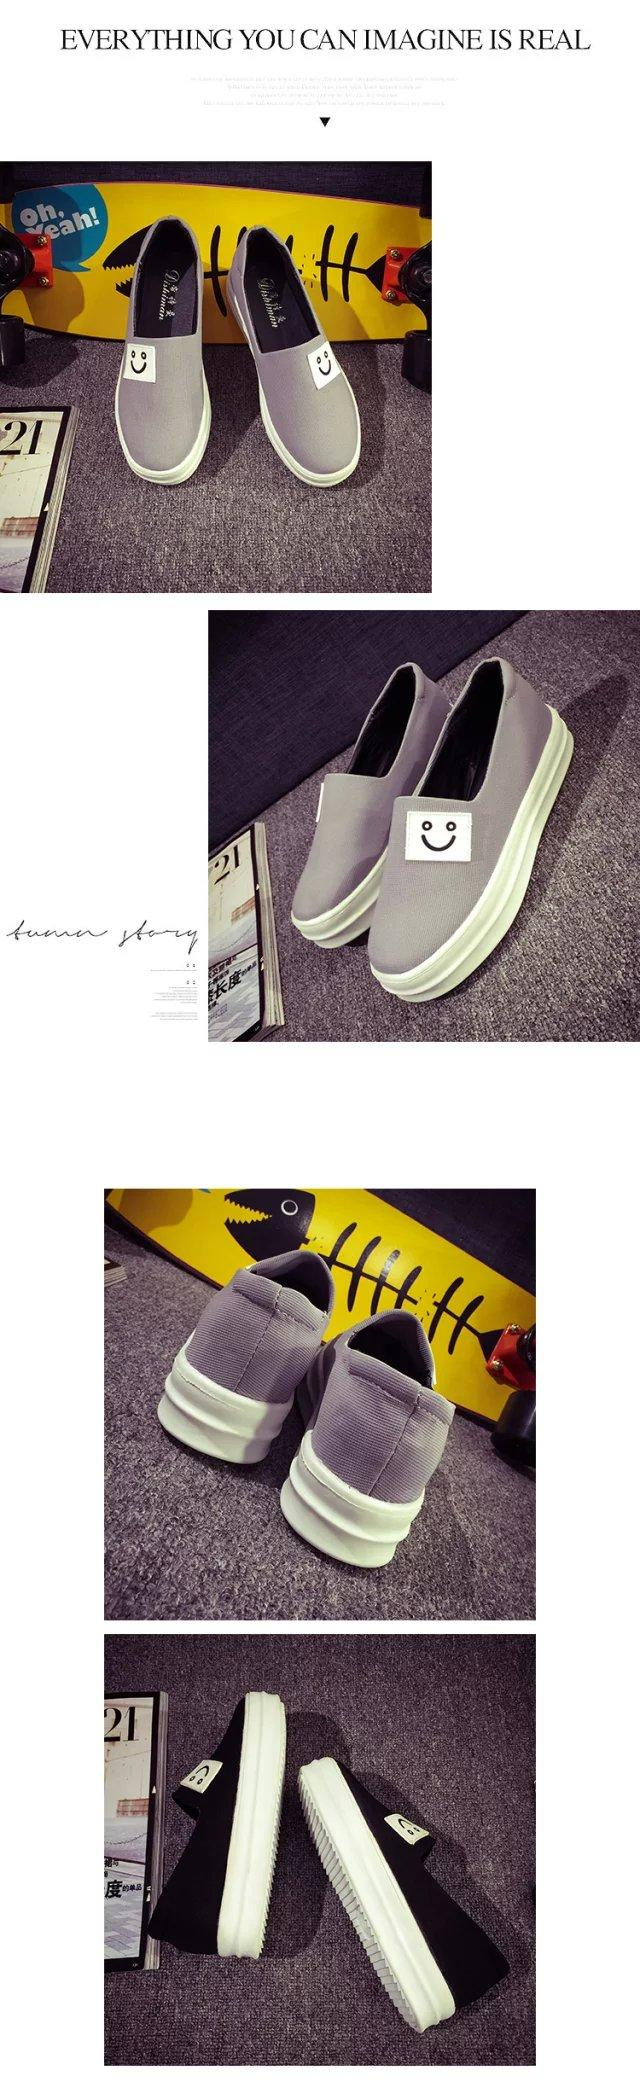 Smiley Platform Slip-Ons - Pixie Pair | YESSTYLE